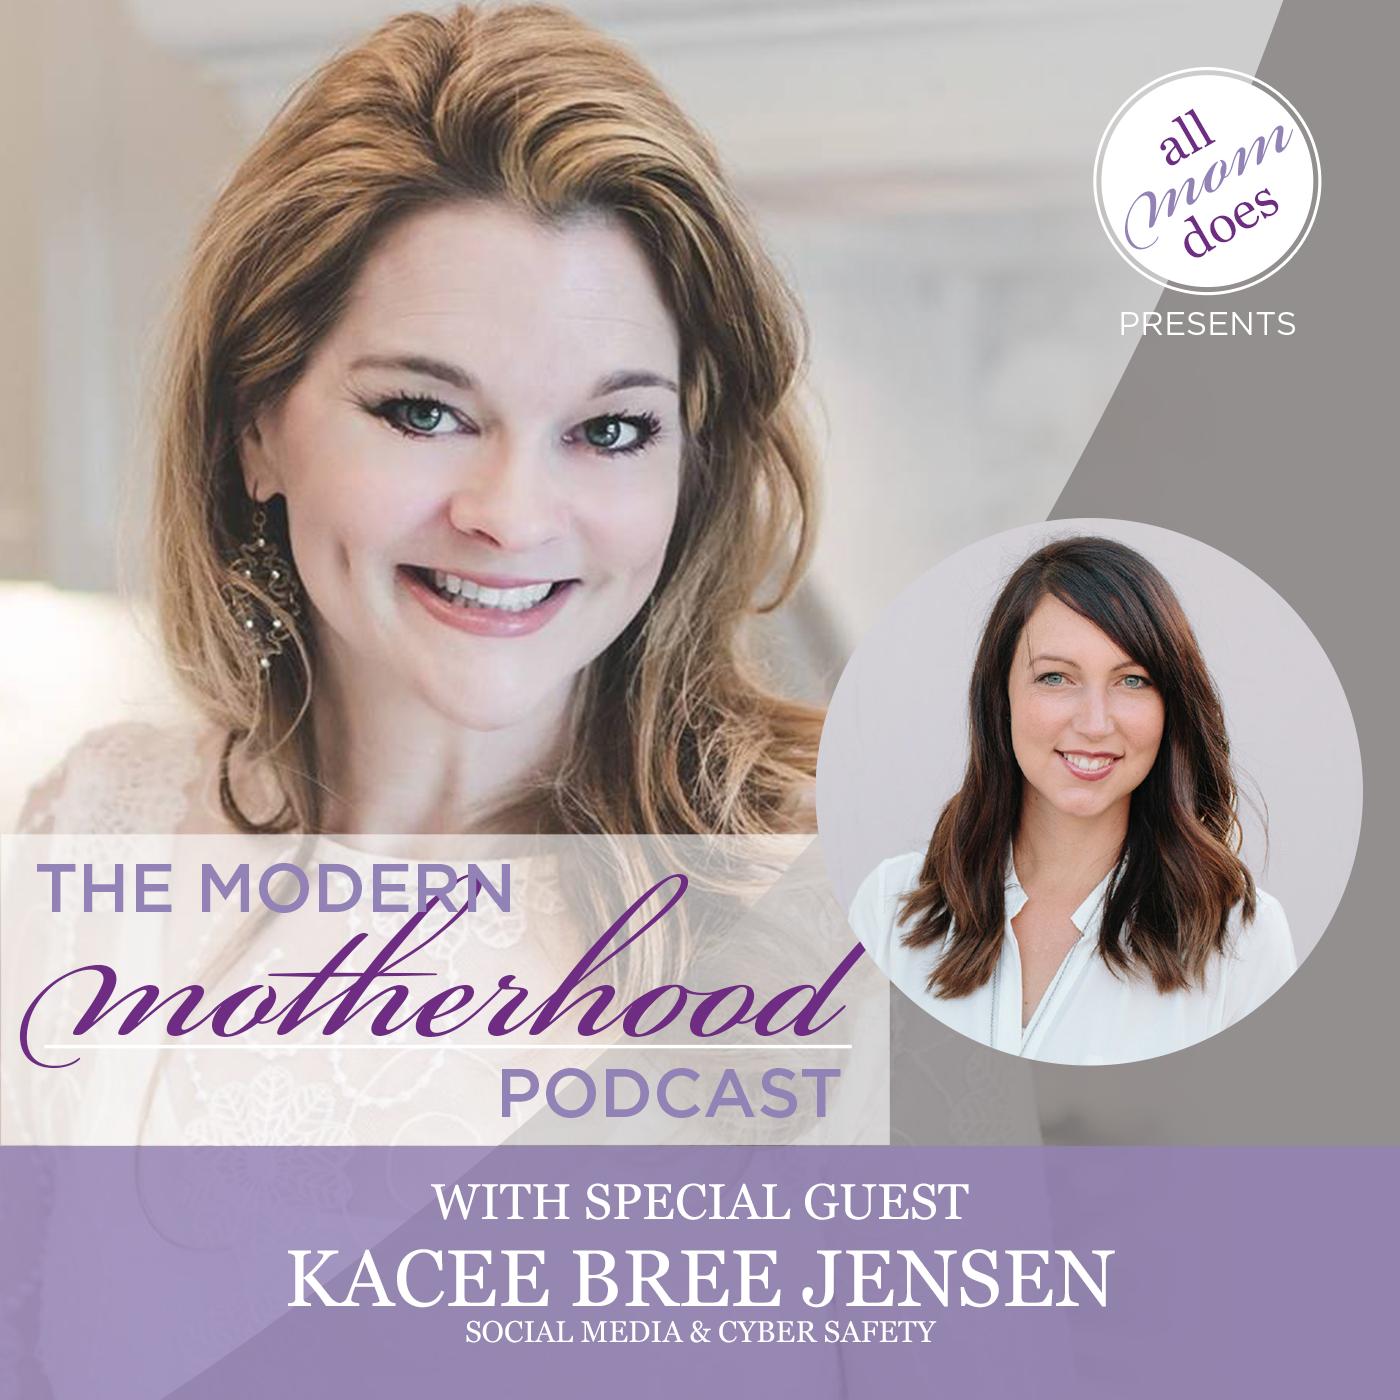 The Modern Motherhood Podcast #26: Kacee Bree Jensen